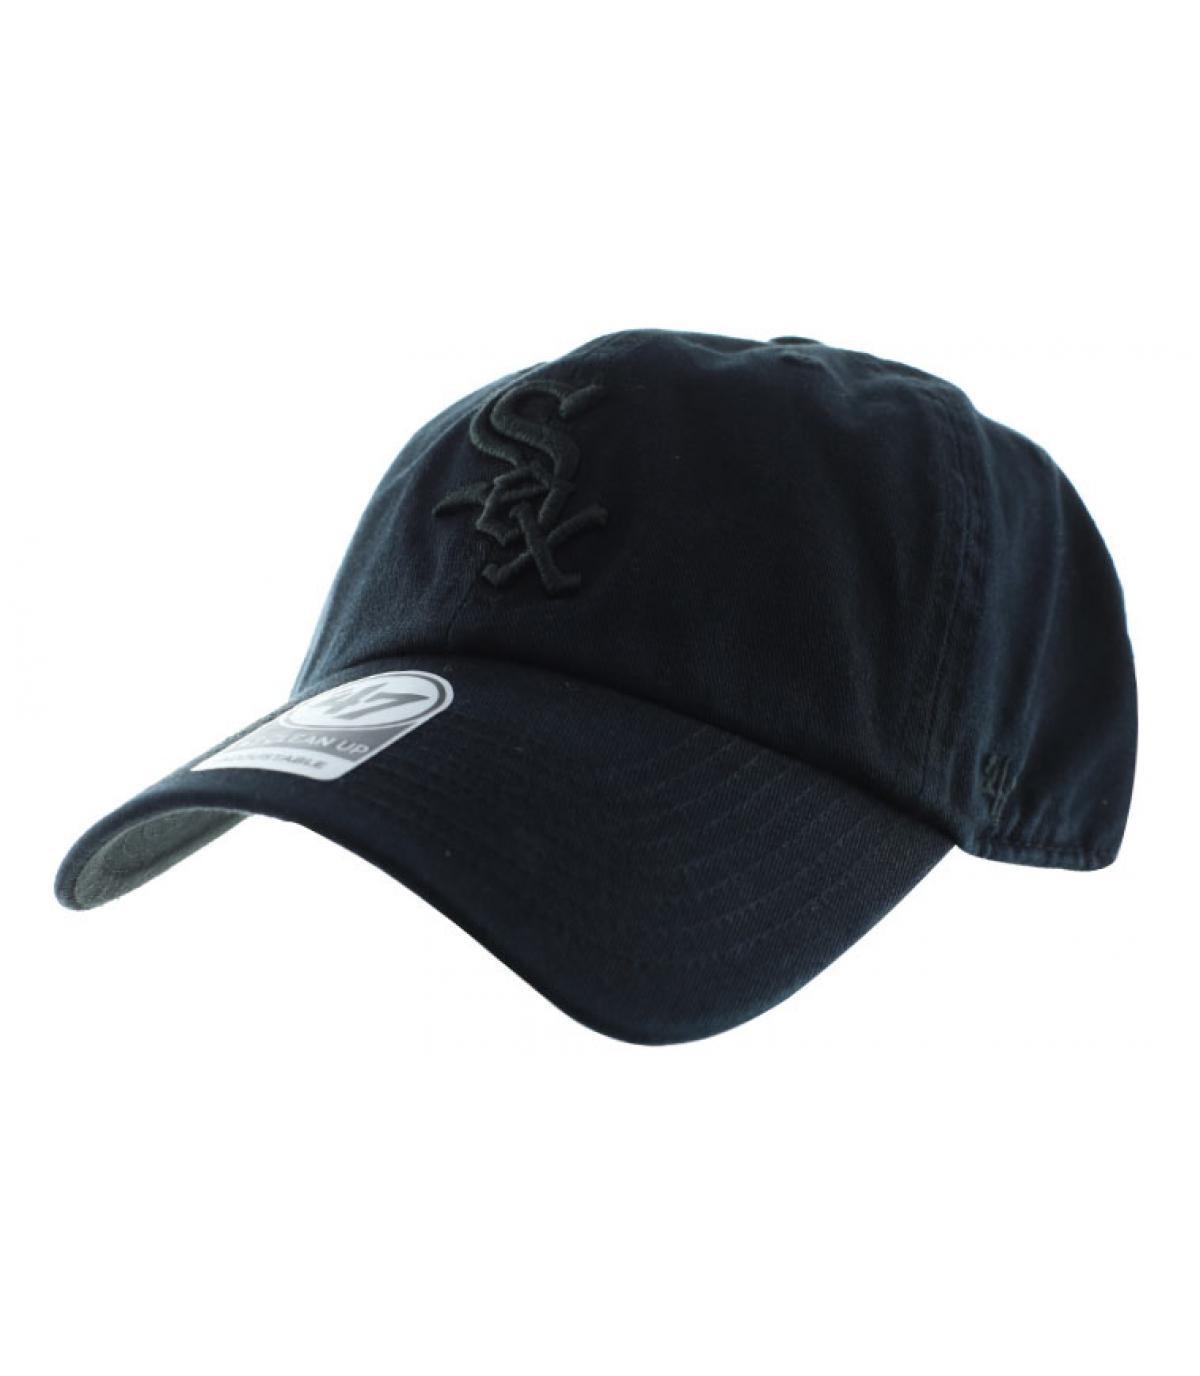 Details Clean Up Sox all black - Abbildung 2